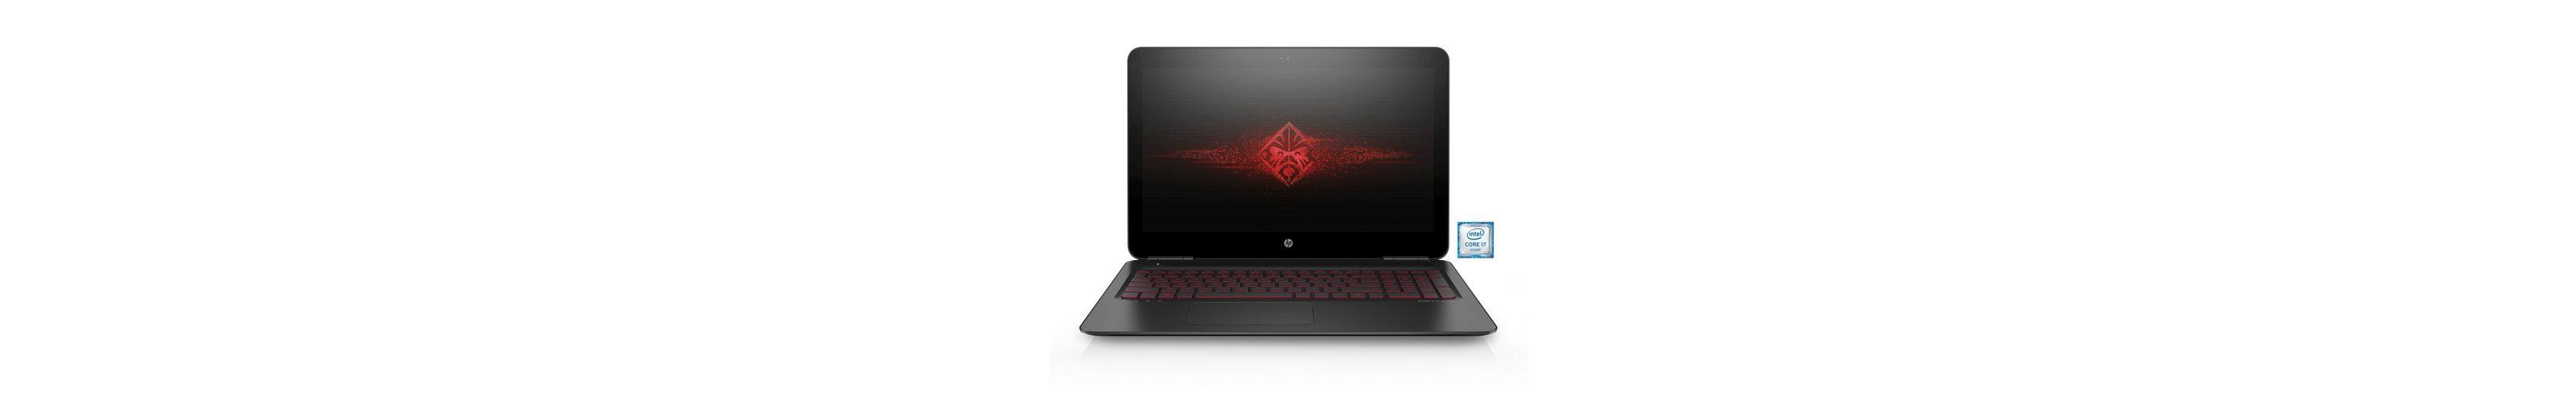 "HP Omen 15-ax008ng Gaming Notebook »Intel Core i7, 39,6cm (15,6""), 128 GB + 2 TB, 16GB«"